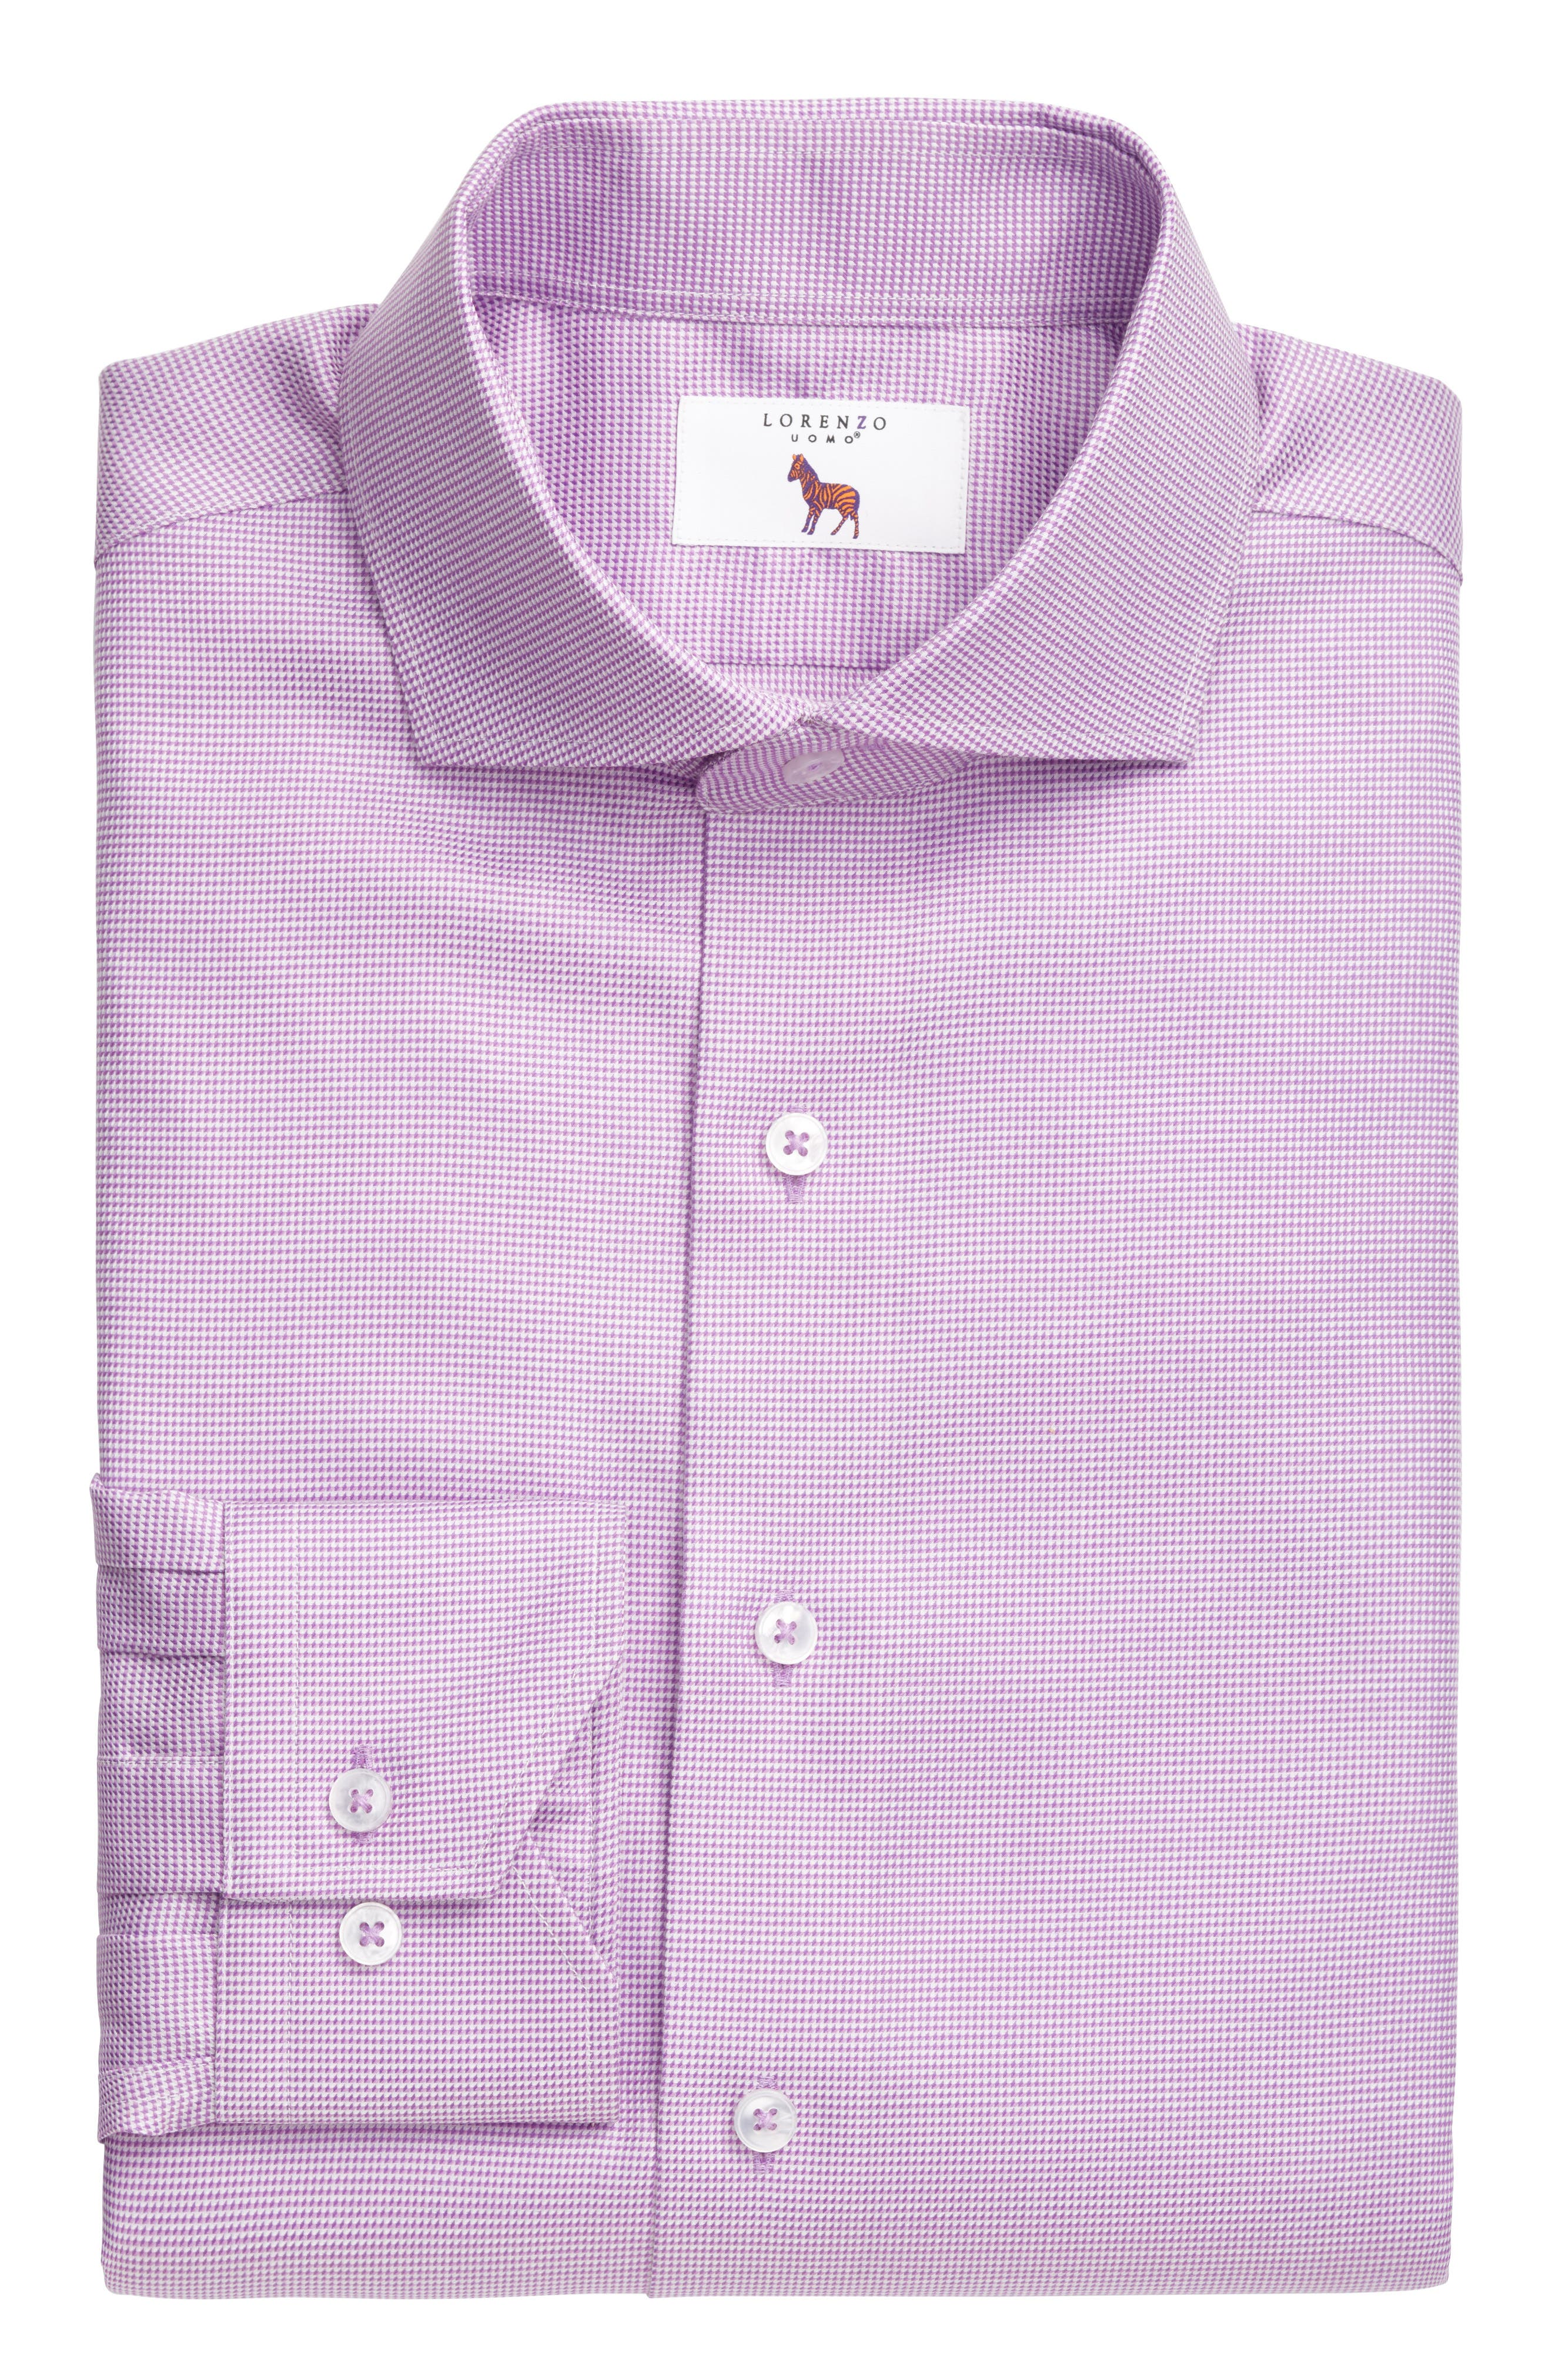 Main Image - Lorenzo Uomo Trim Fit Houndstooth Dress Shirt